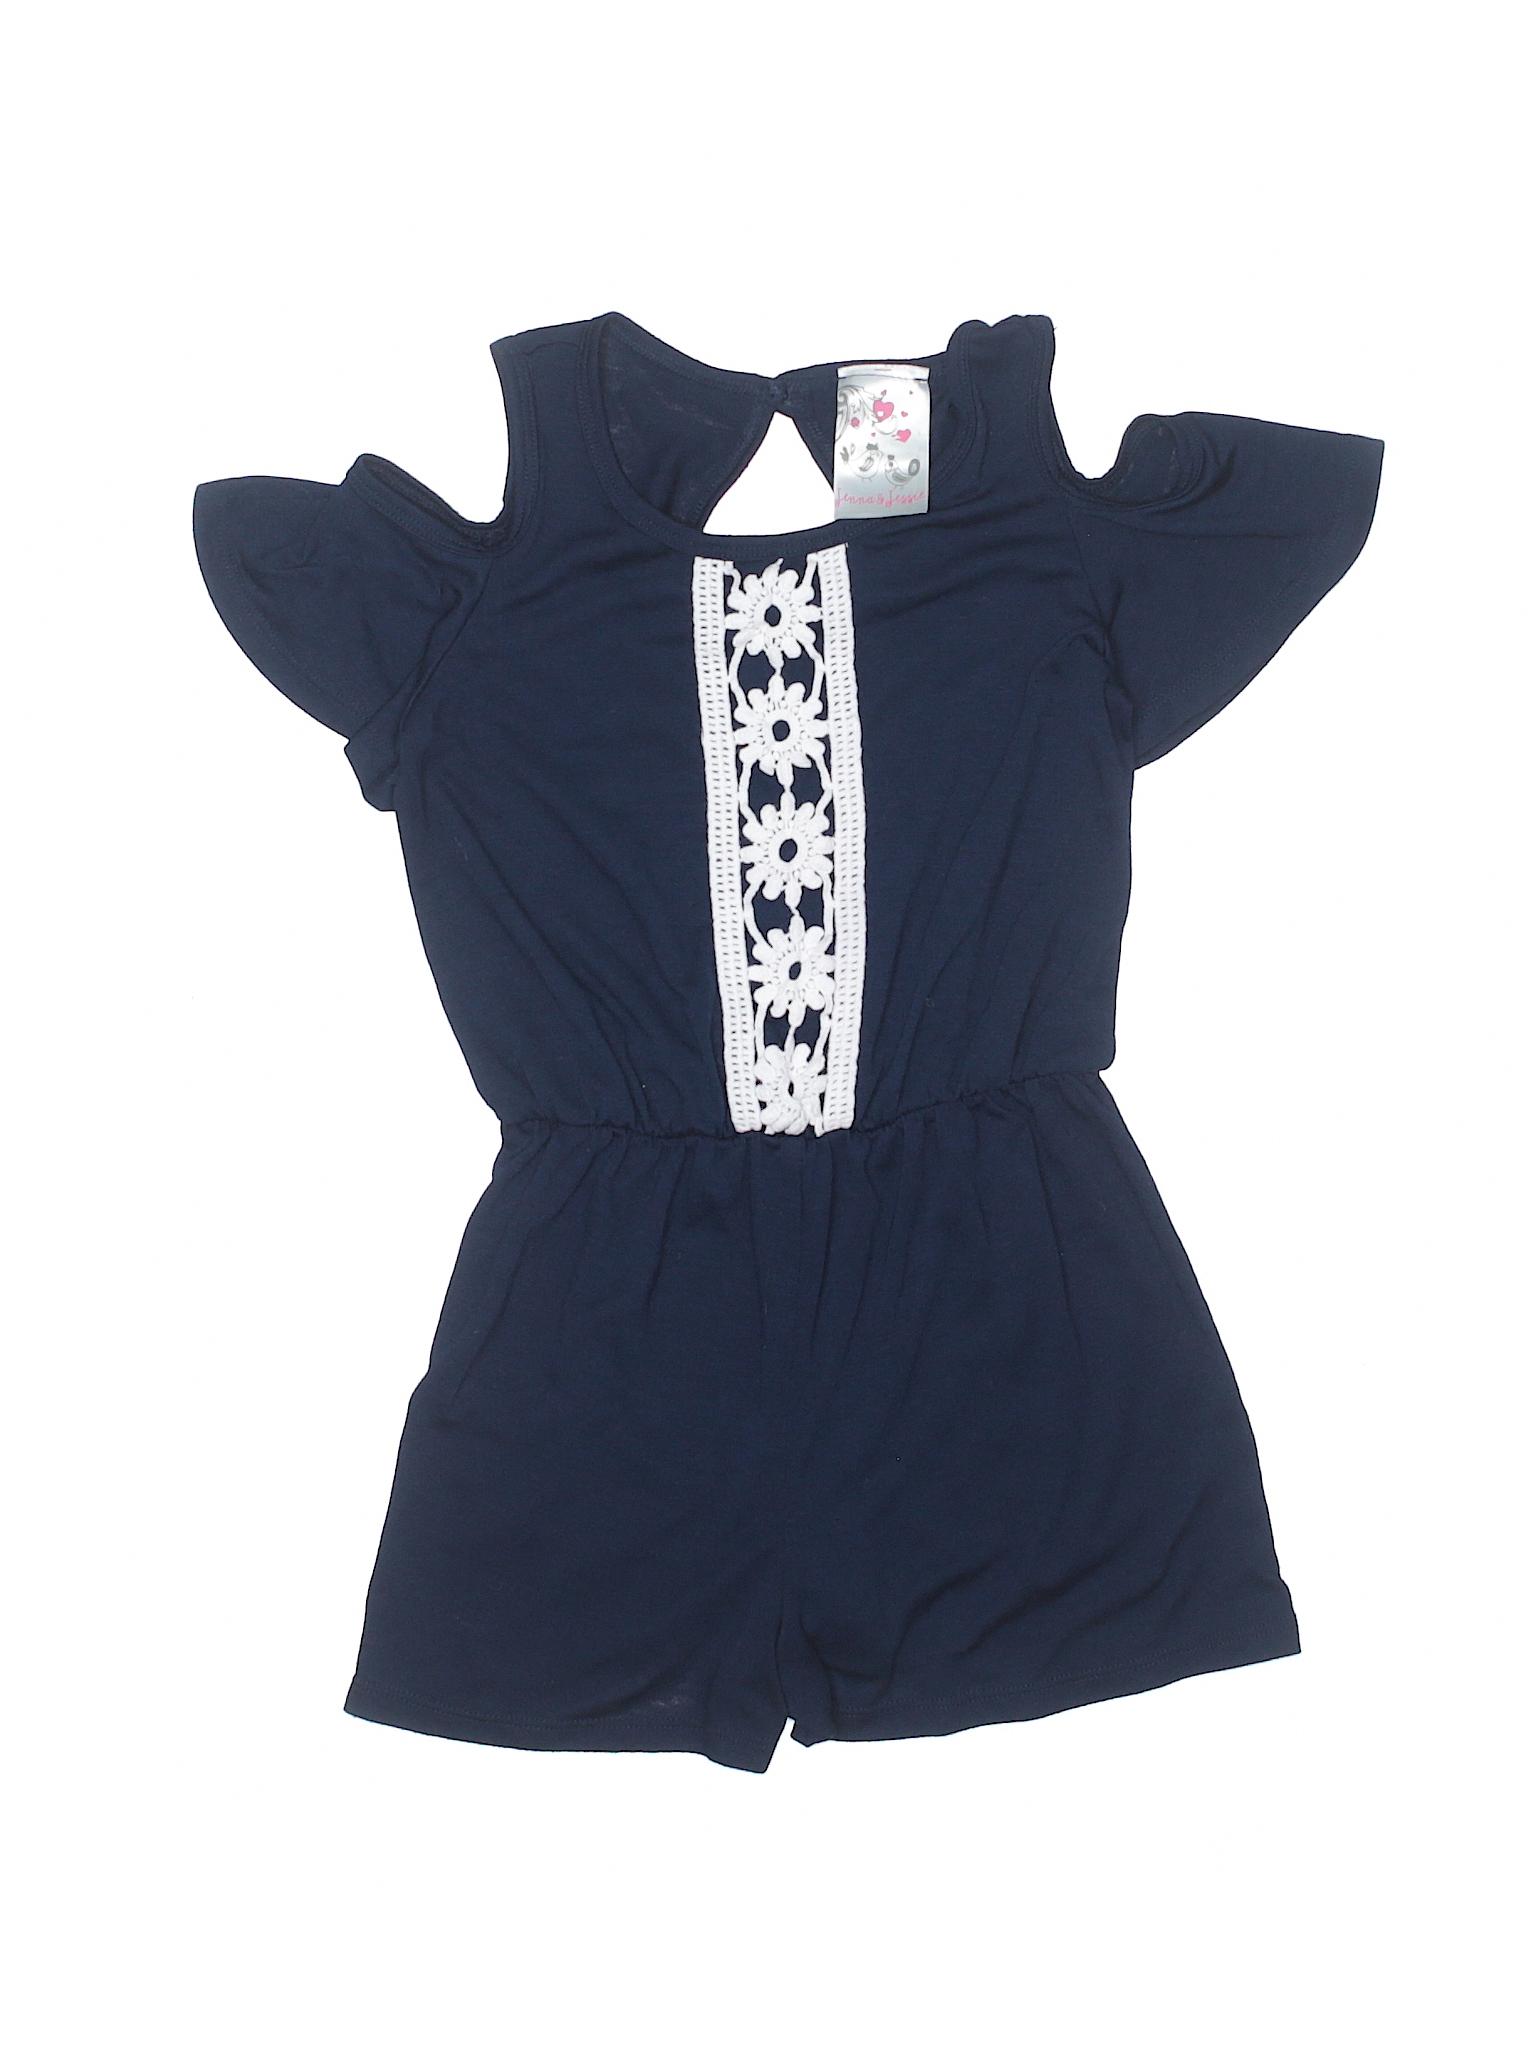 22cf2615df12 Jenna   Jessie Solid Navy Blue Romper Size 6 - 65% off